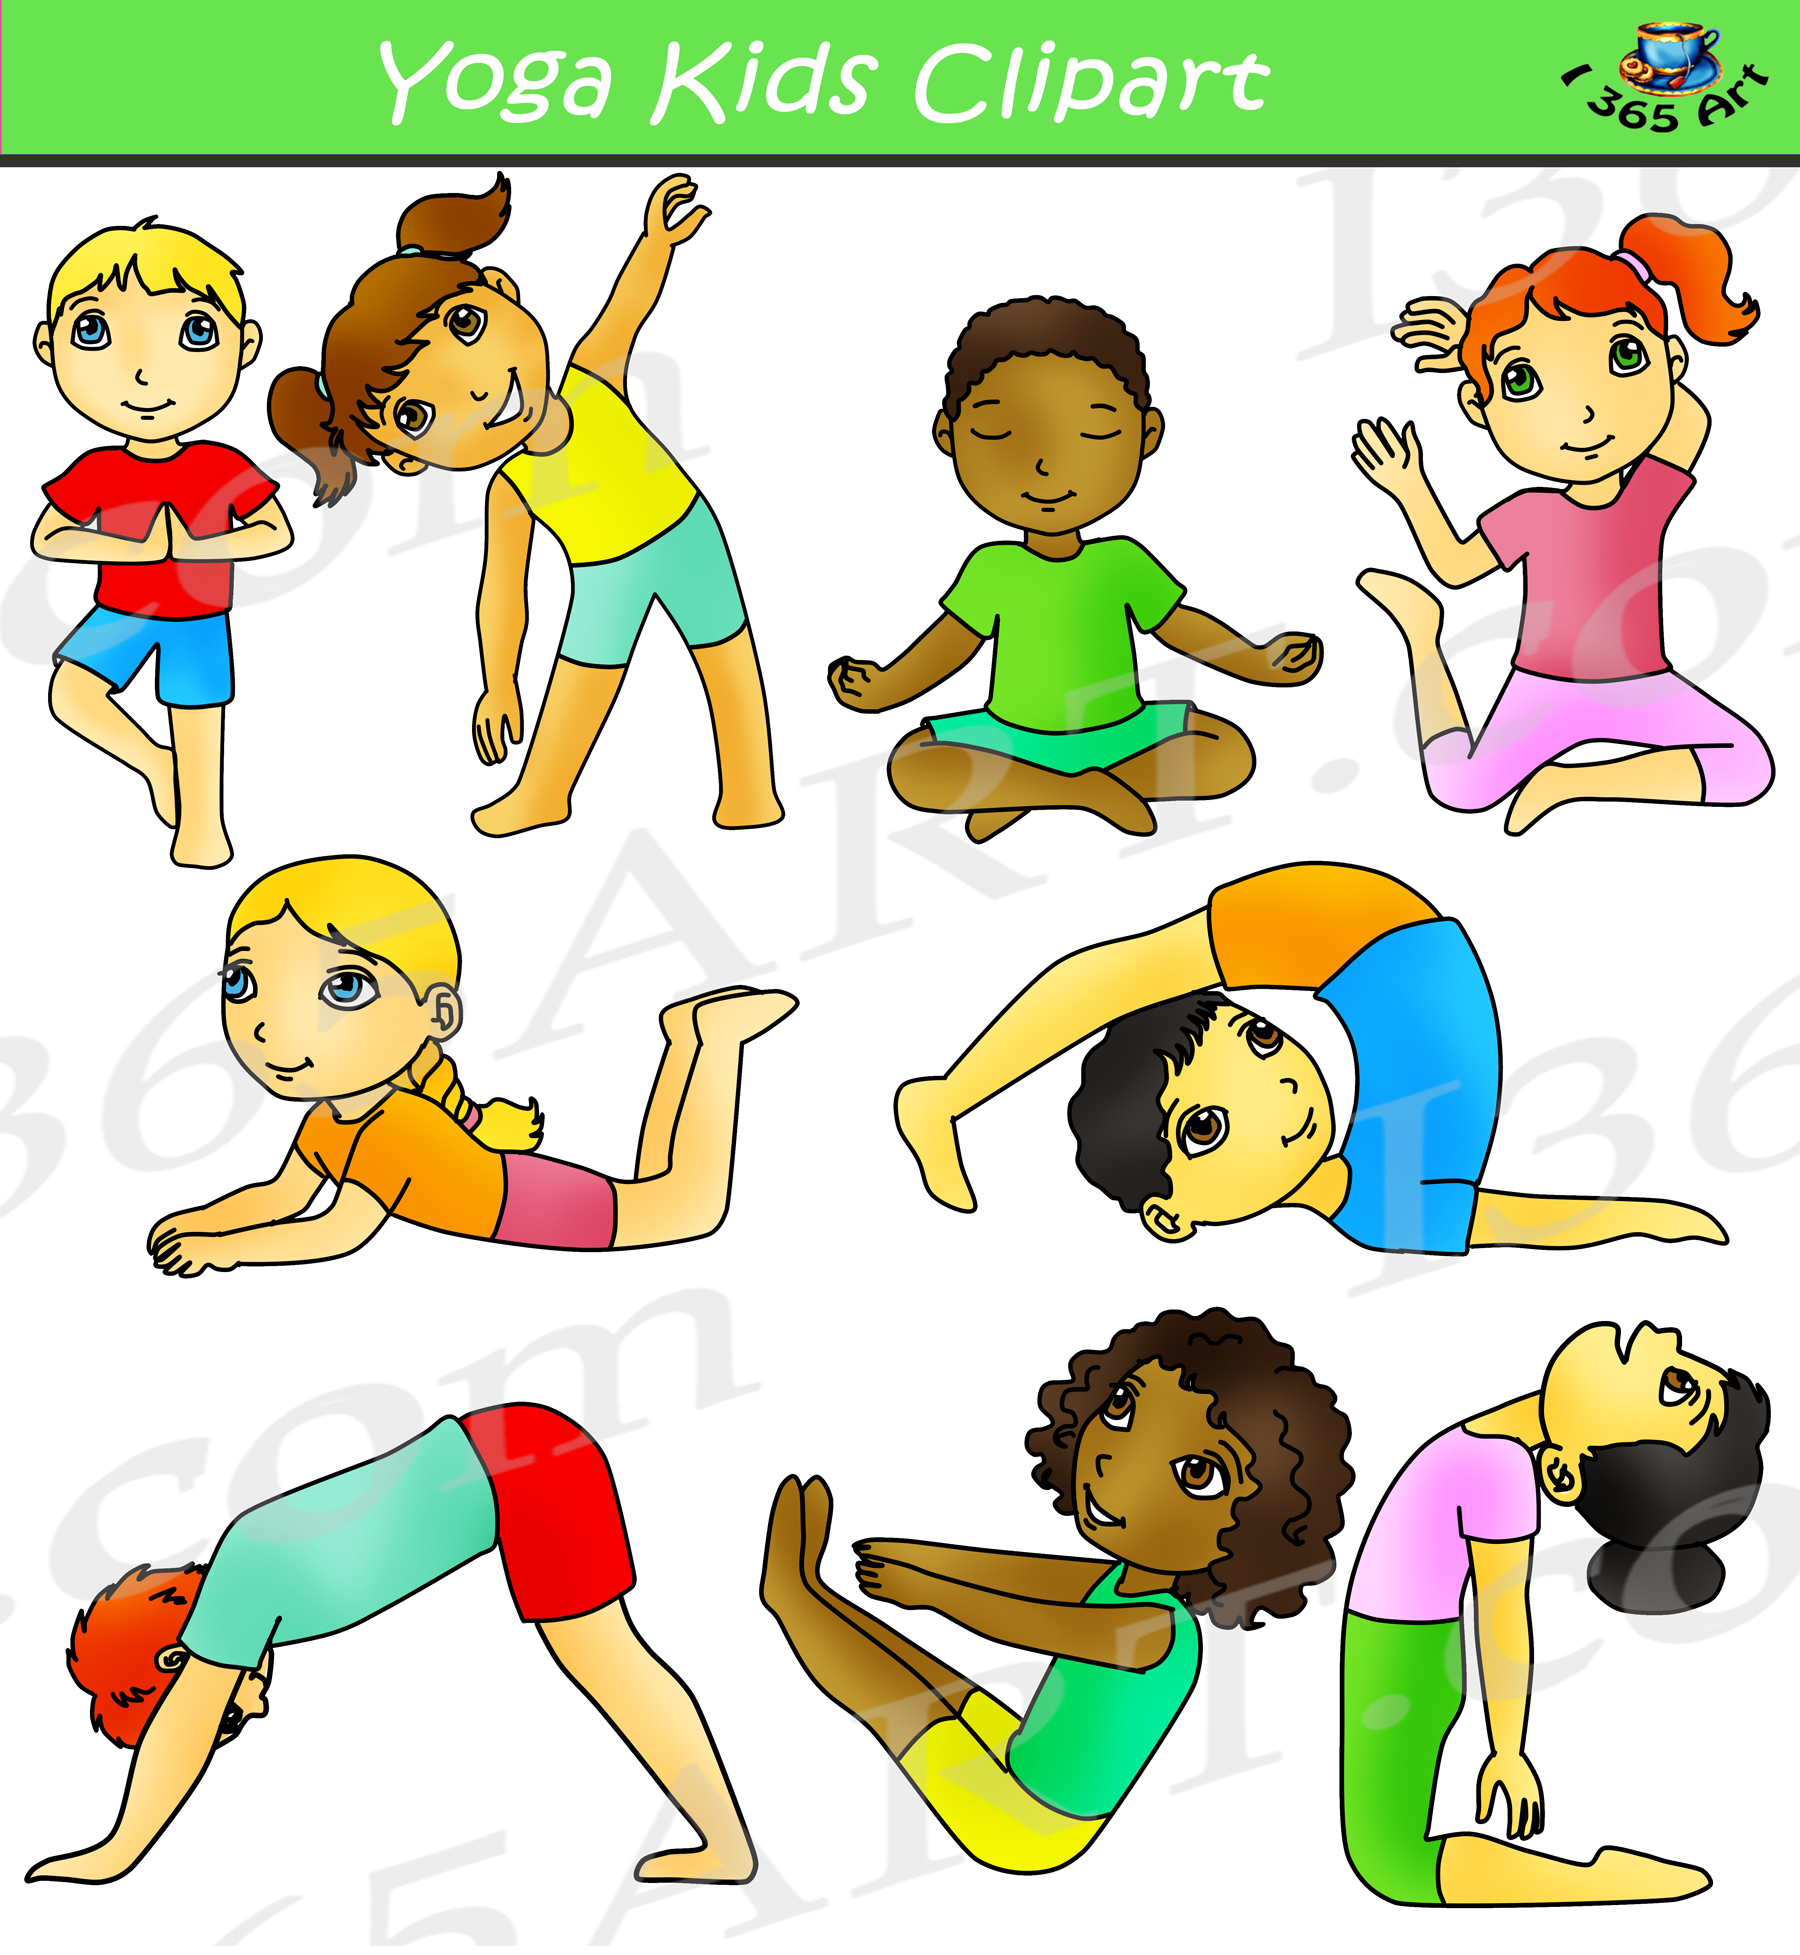 Kids Yoga Clipart Activity Set